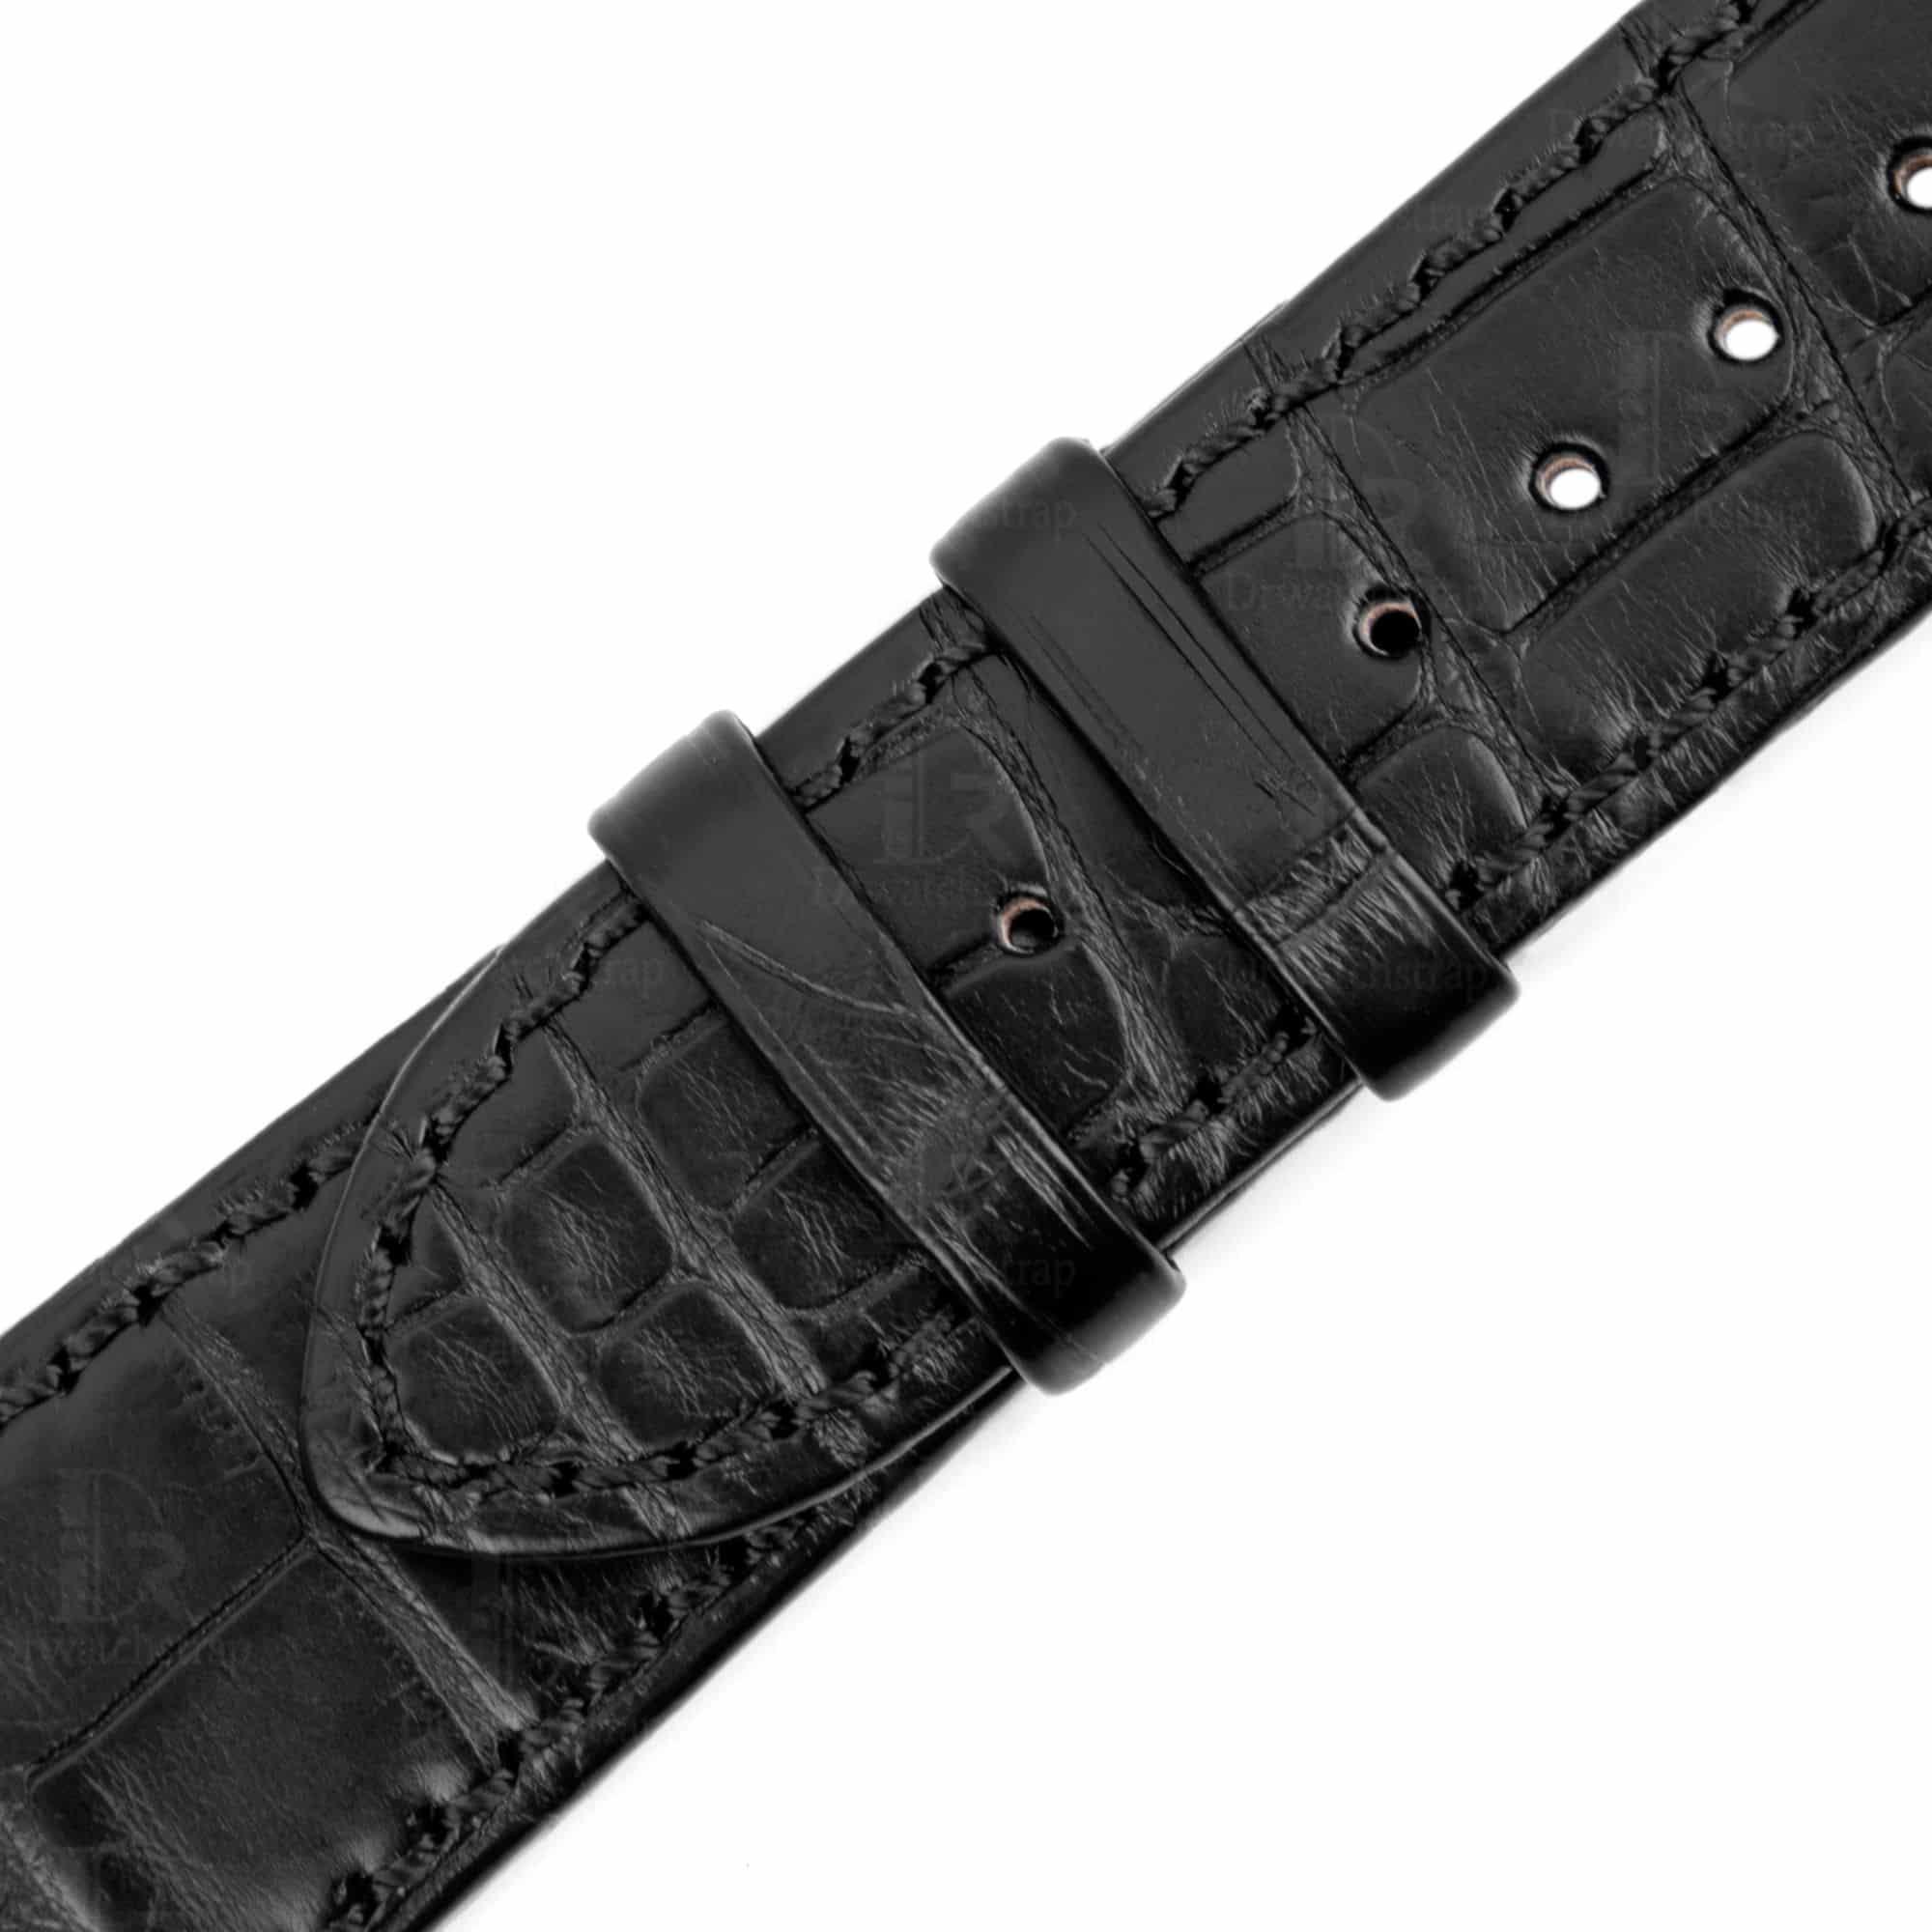 Buy discount price aftermarket Vacheron Constantin Overseas Leather Strap craftsmanship Black American Crocodile watch bands for sale